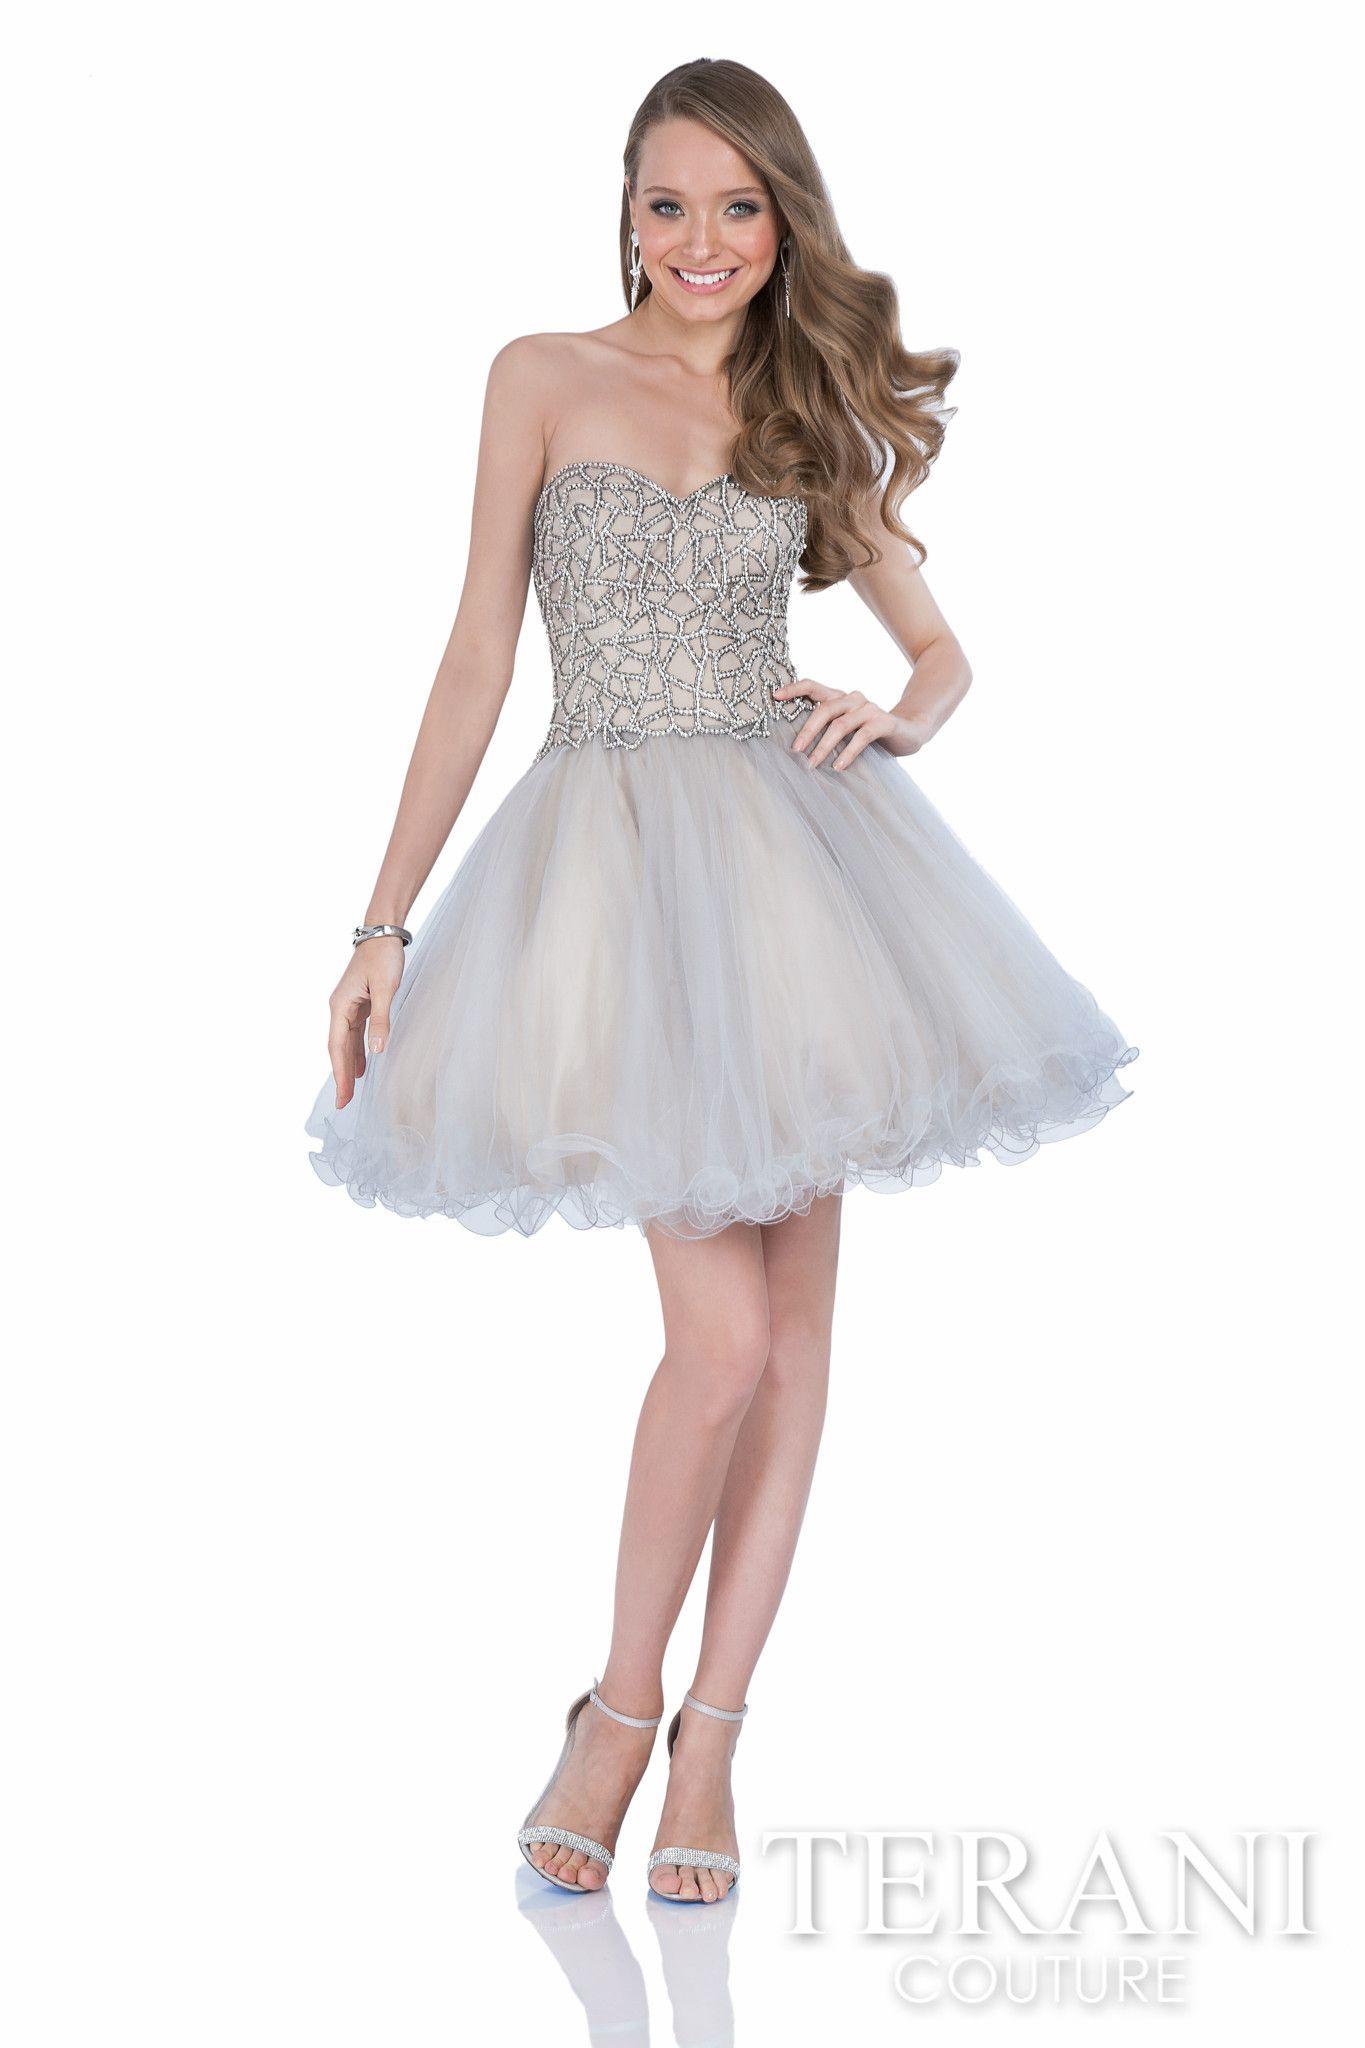 Sweetheart prom dress with rhinestones arranged in a geometric motif ...